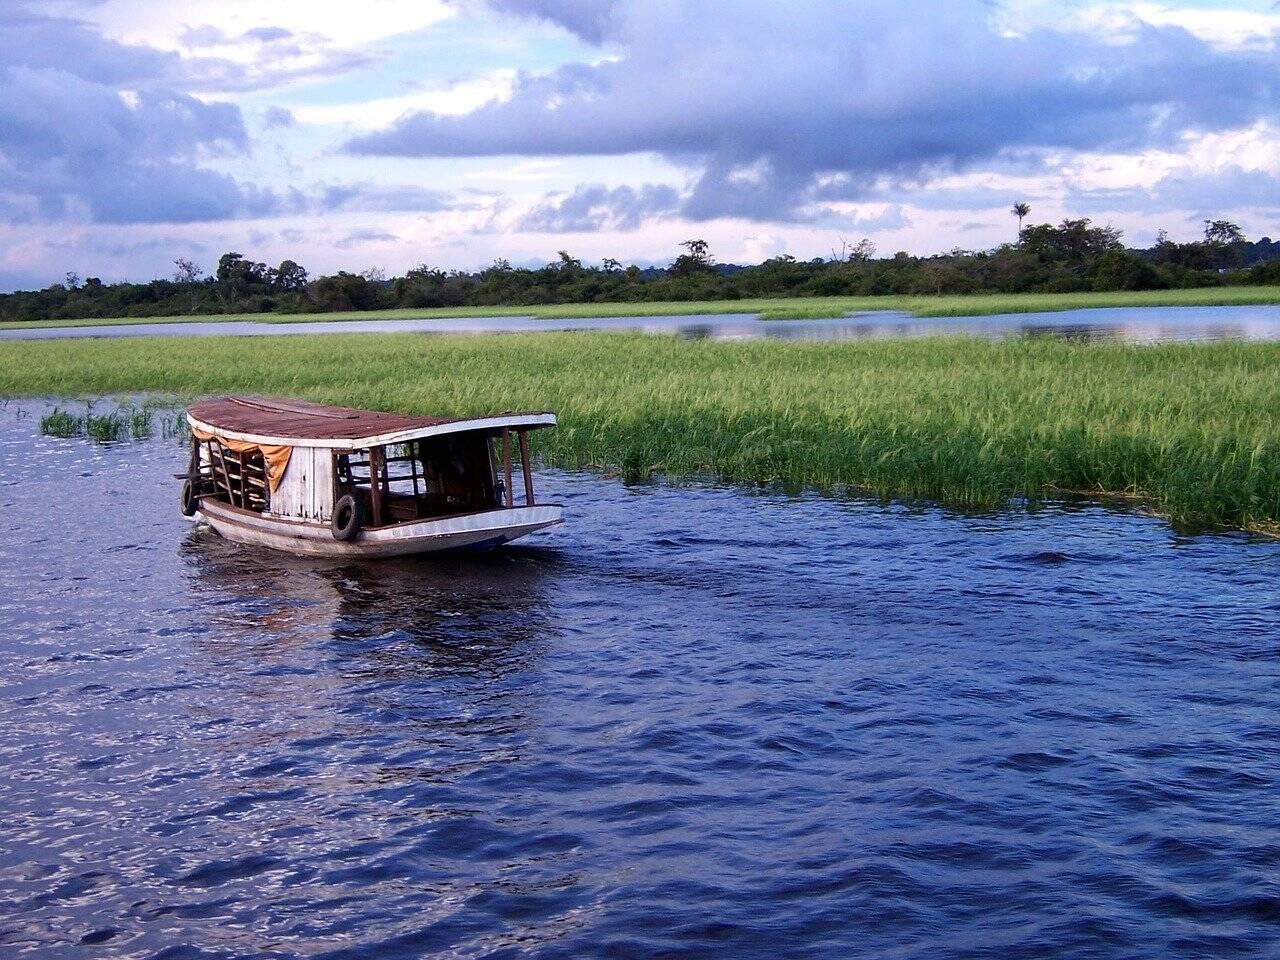 Barco de pescador navega sobre rio na floresta amazônica. Foto: Pixabay